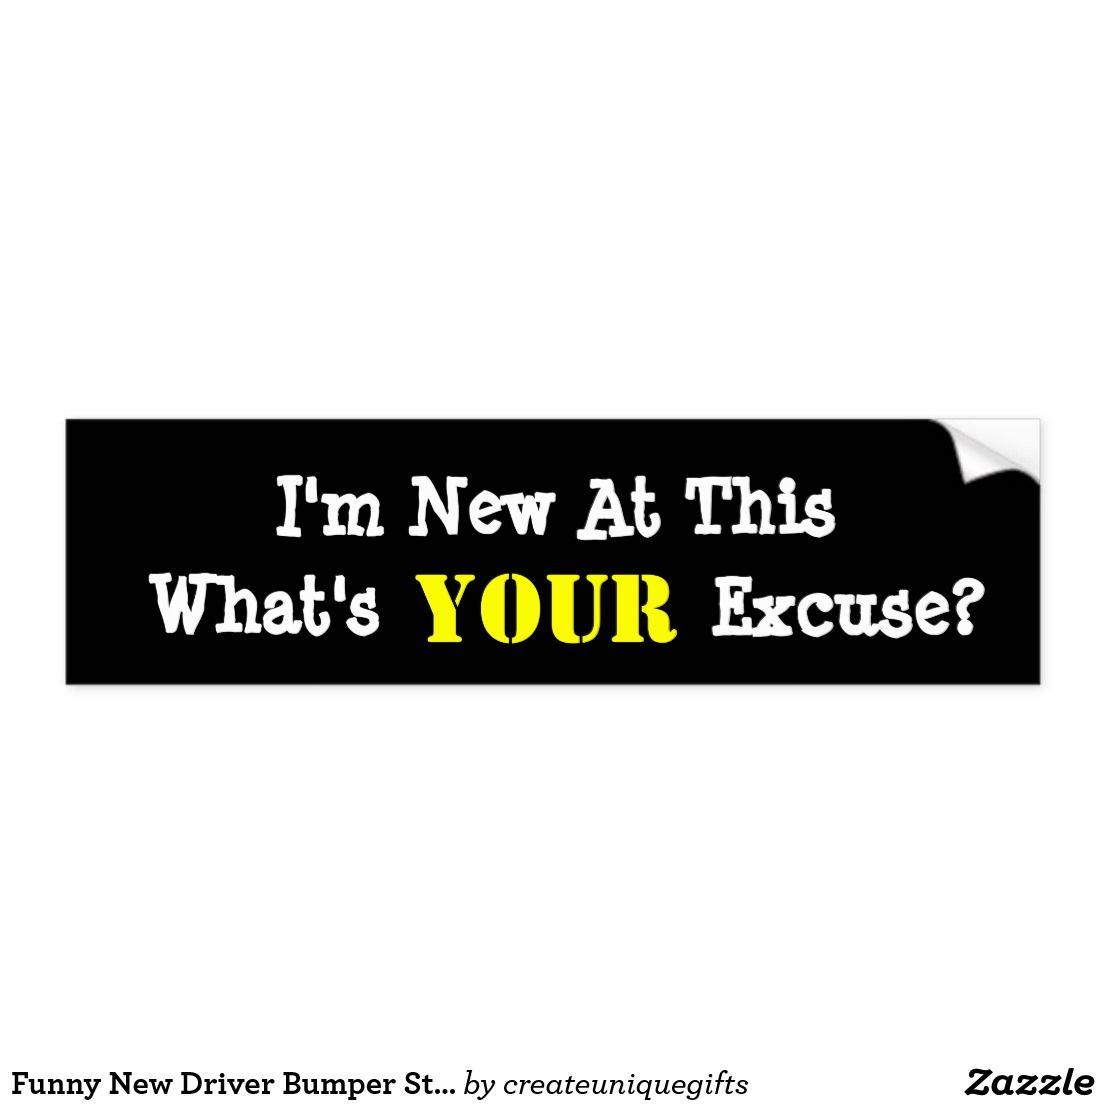 Funny New Driver Bumper Sticker Zazzle Com In 2021 New Drivers Funny Bumper Stickers Bumper Stickers [ 1106 x 1106 Pixel ]